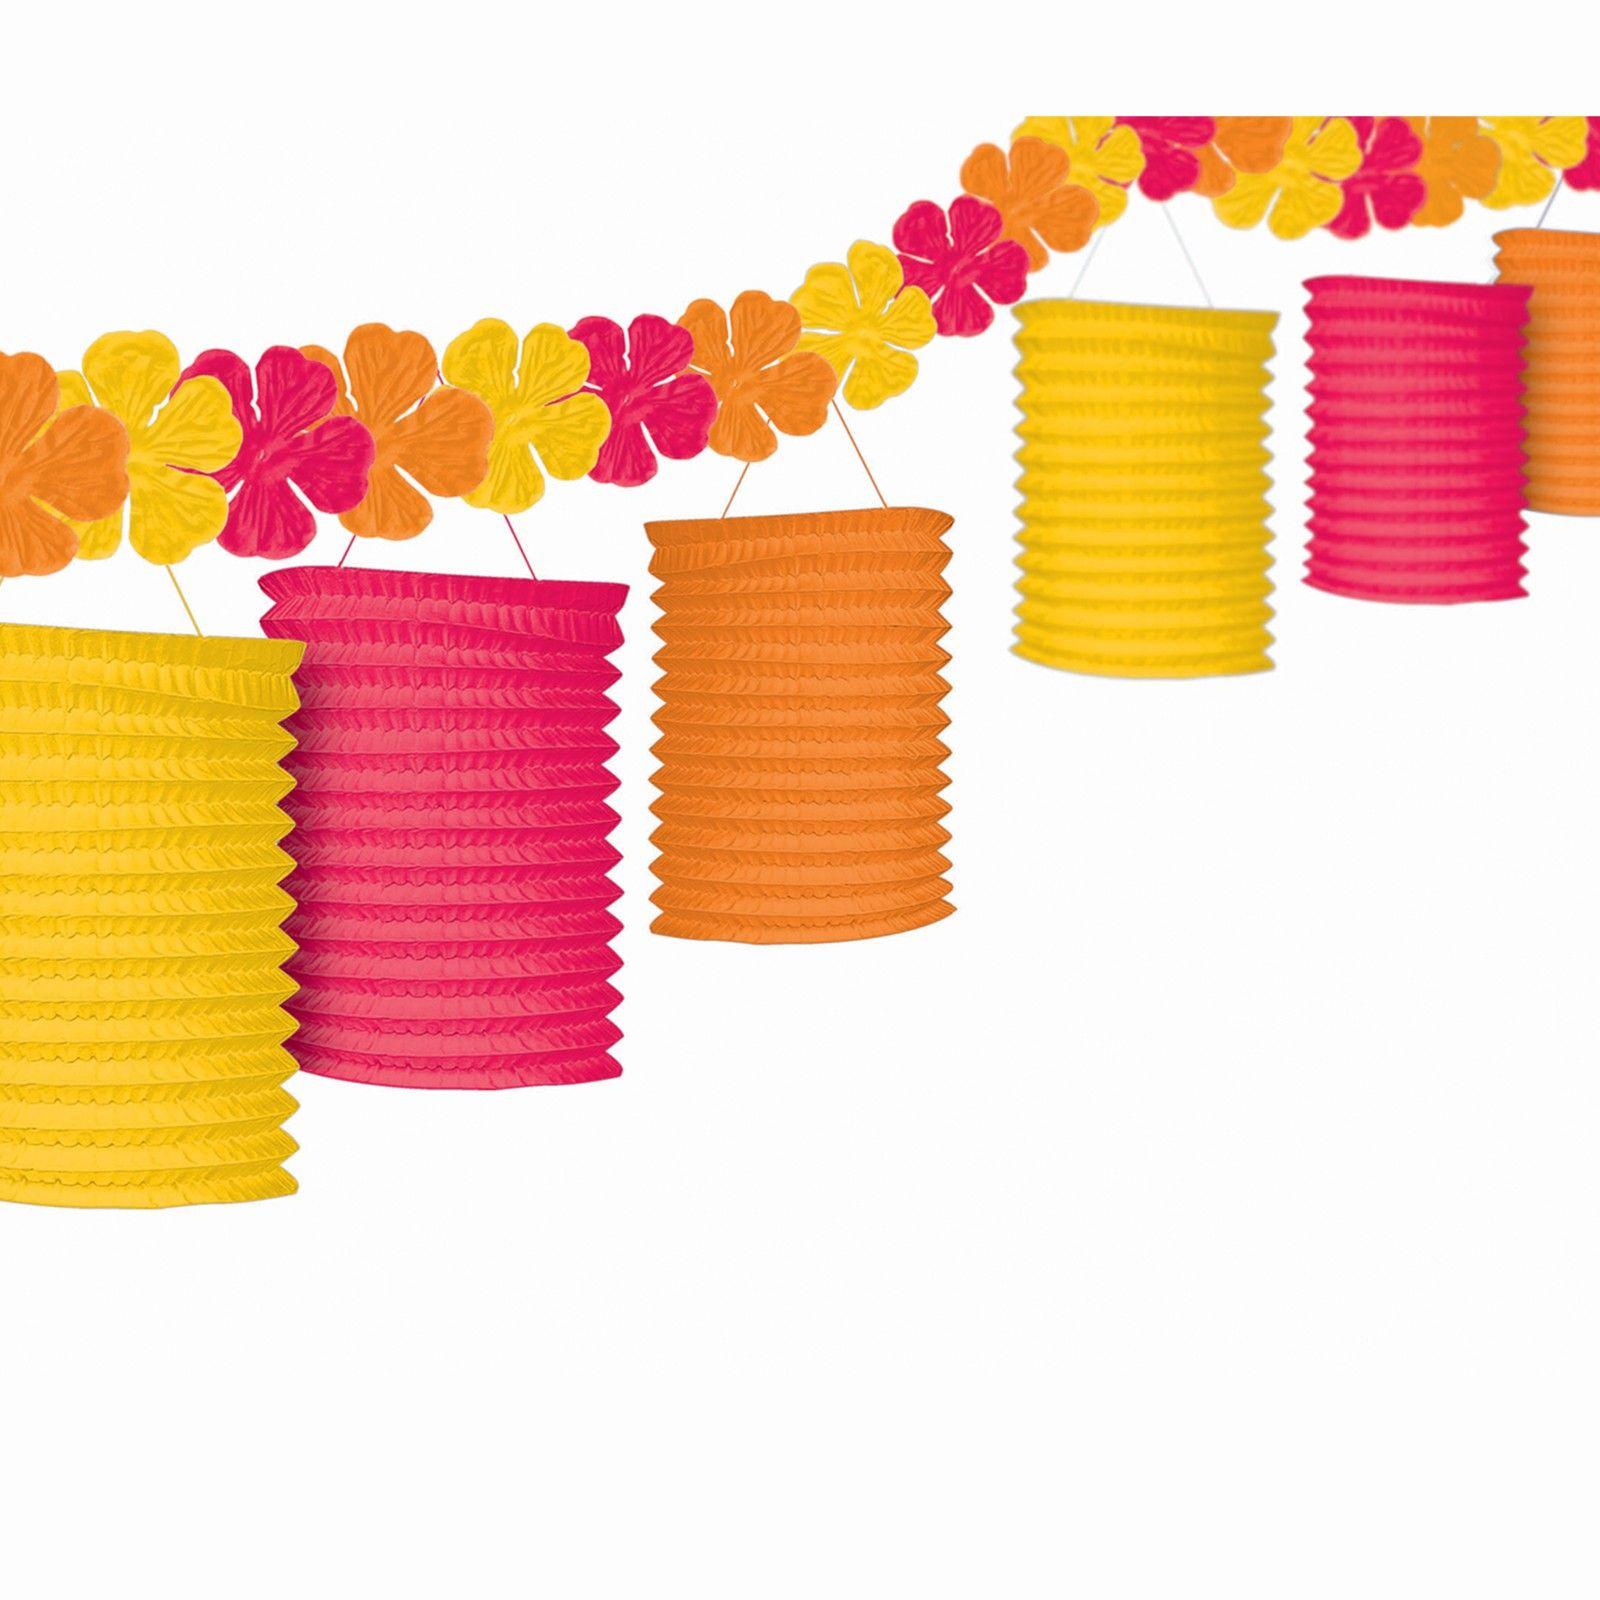 Garland lanterns Hawaiian party decorations, Luau